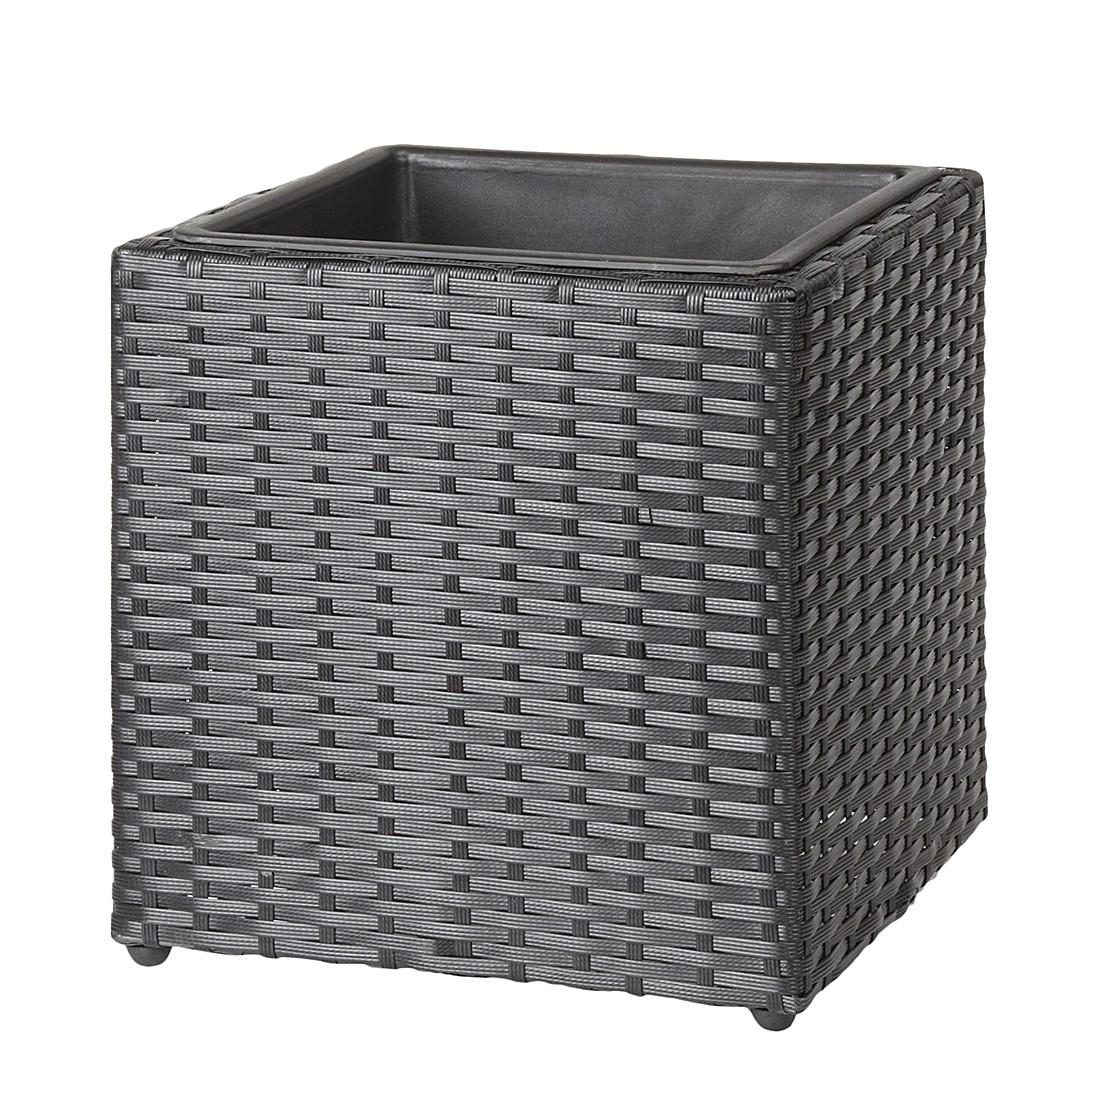 preisvergleich eu polyrattan schwarz. Black Bedroom Furniture Sets. Home Design Ideas